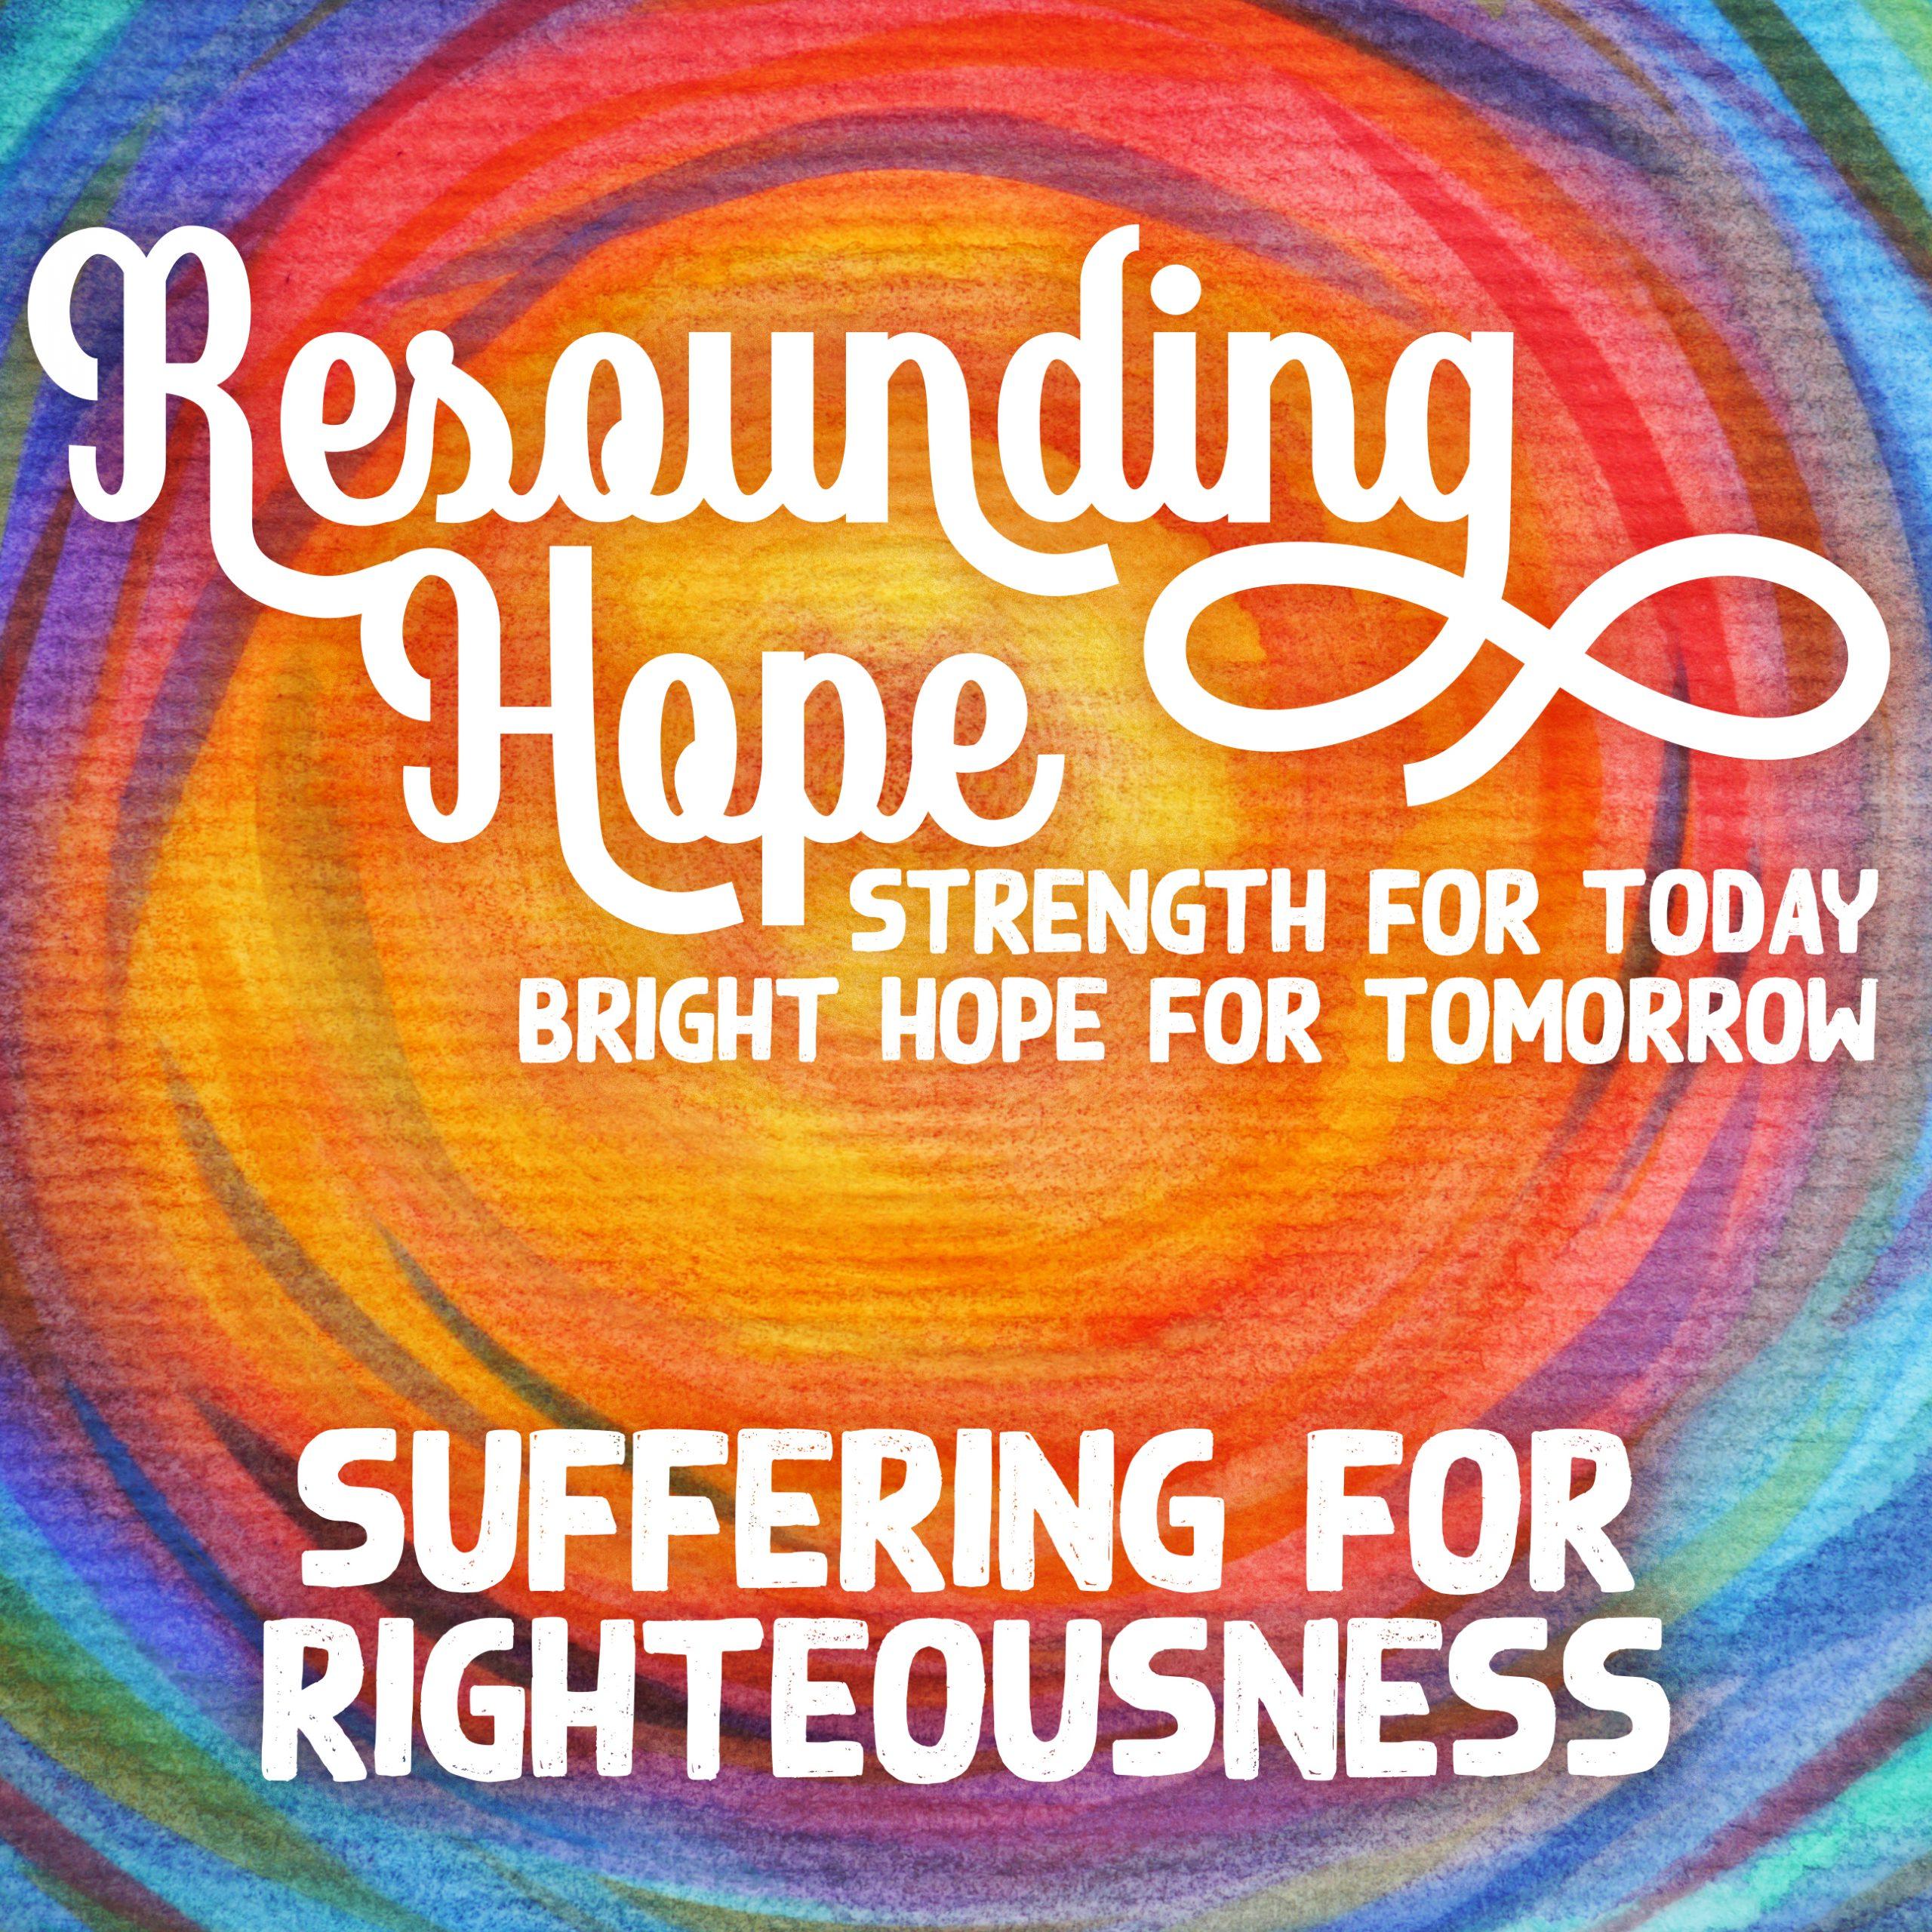 Resounding Hope Web 6